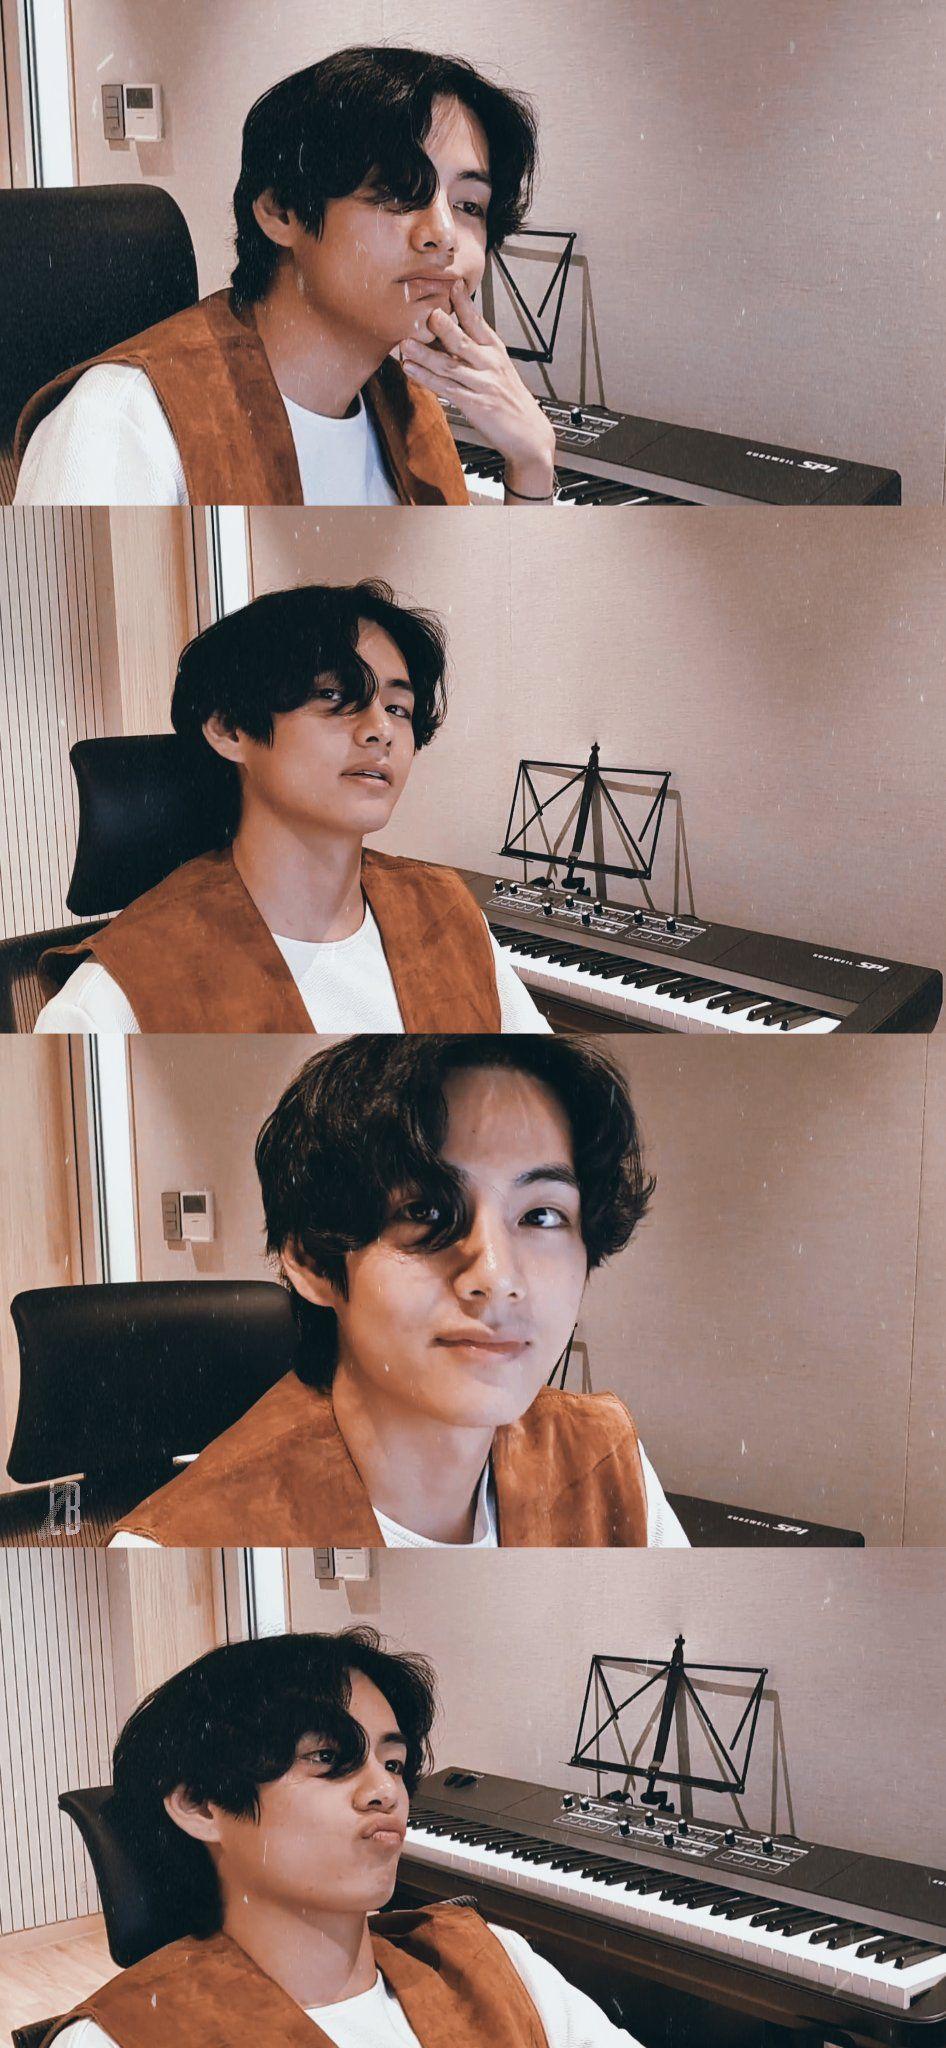 Pin by ℋ𝓉ℯ𝓉 ℳ𝓎𝒶𝓉🍀 on V ( Kim Taehyung ) in 2020 Taehyung